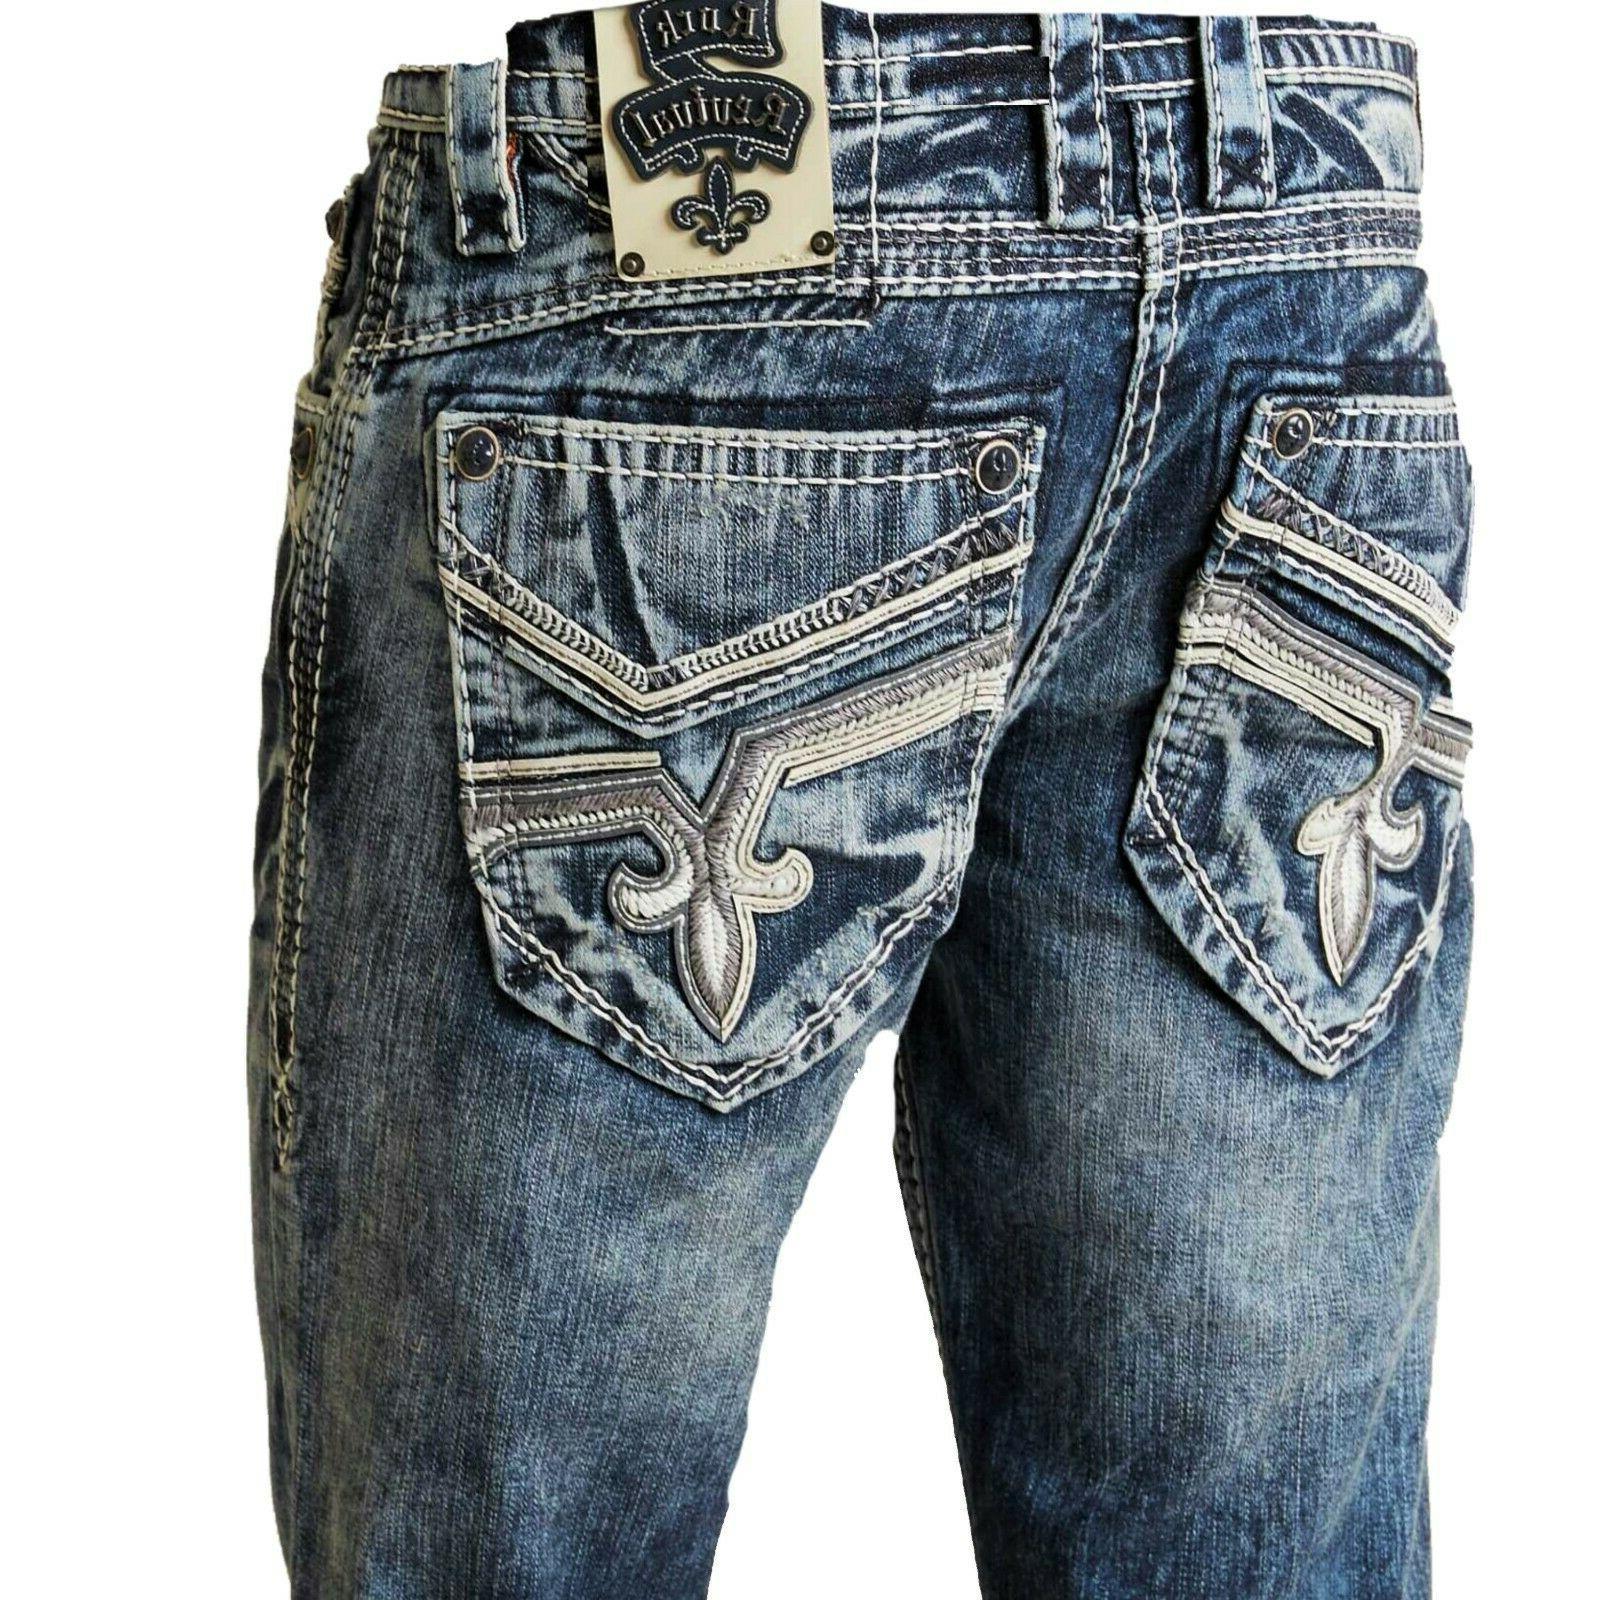 *NWT Mens Cael Jeans - 32 40